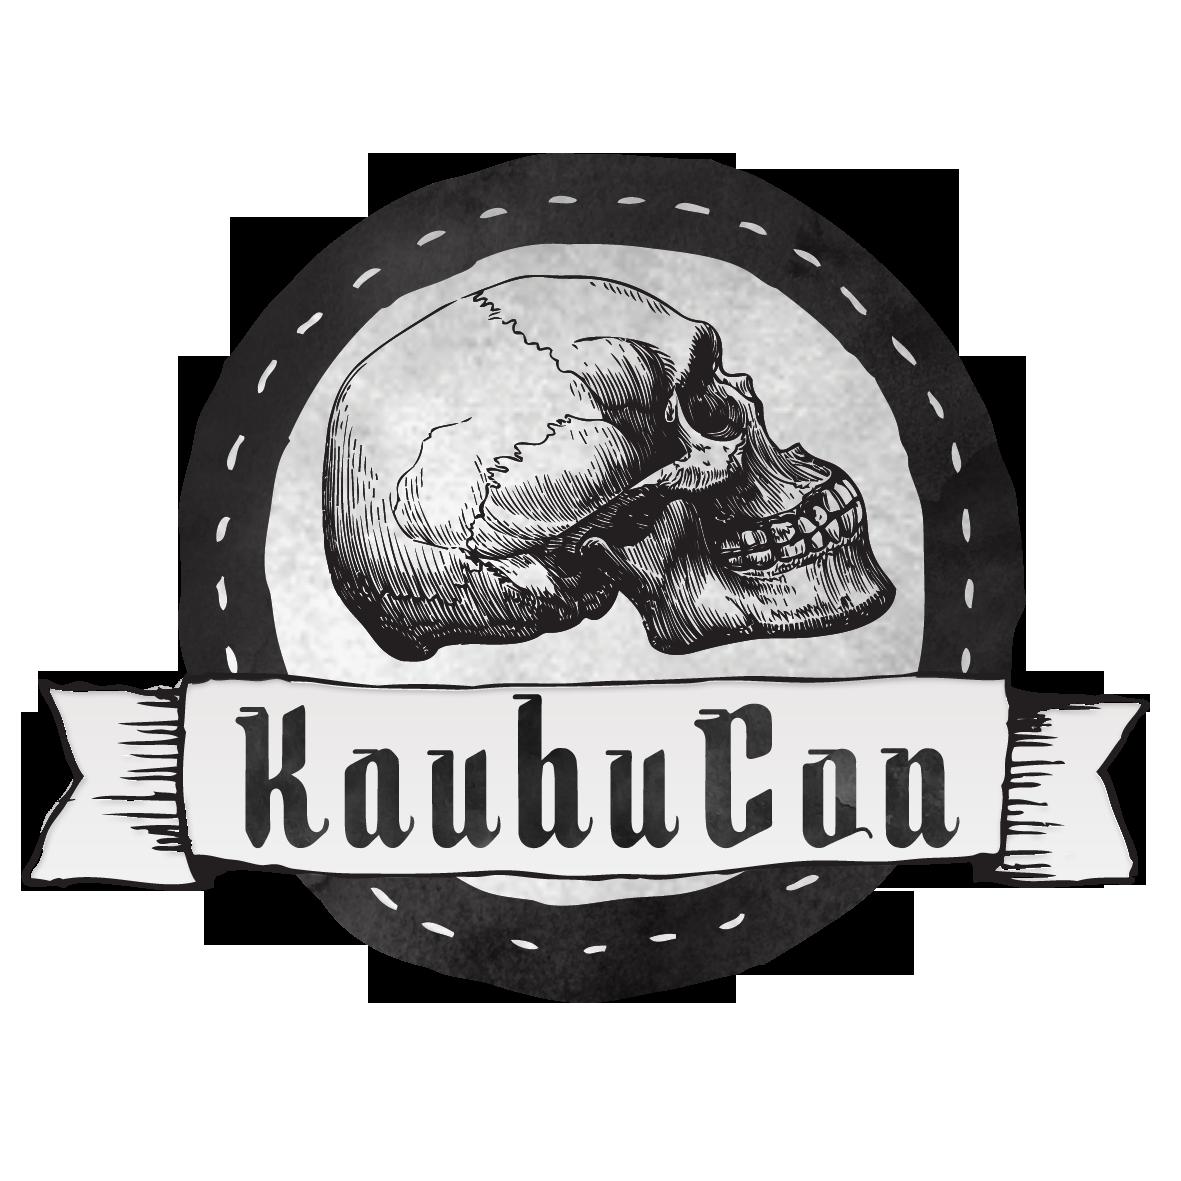 kauhucon_logo